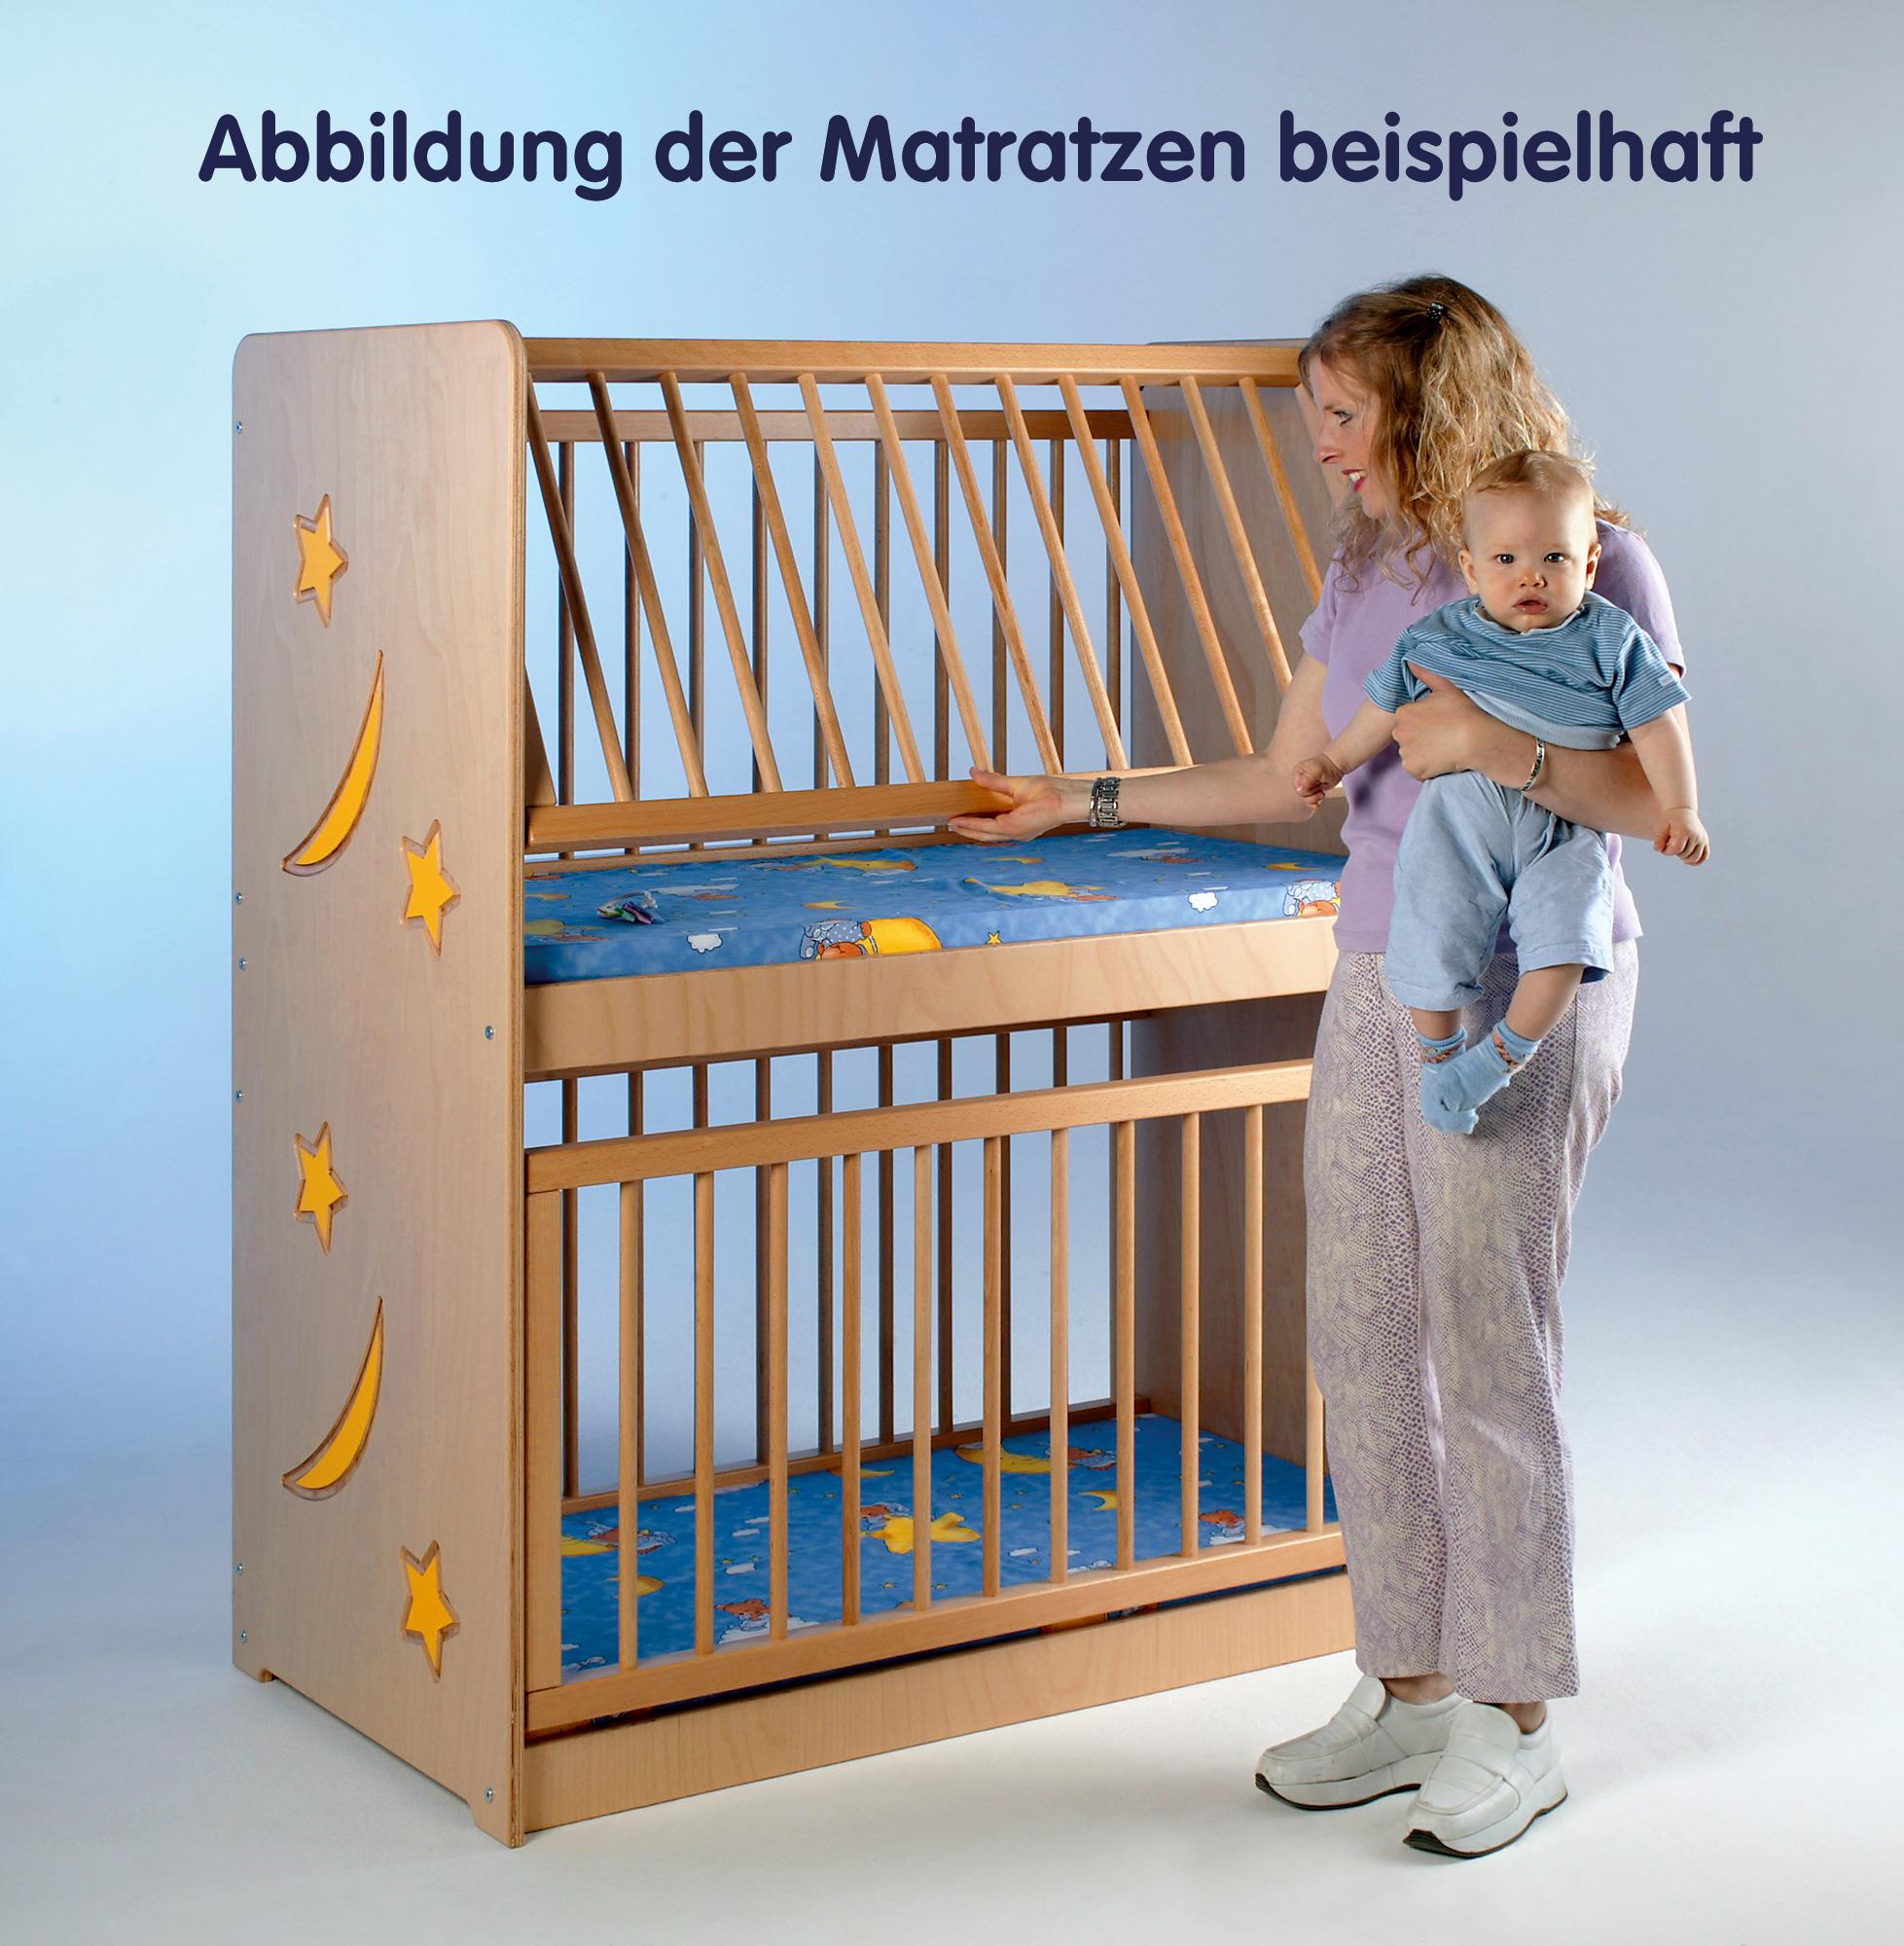 matratze f r stockbett 70 x 140 cm liegefl che lms lehrmittel service h sp th gmbh. Black Bedroom Furniture Sets. Home Design Ideas